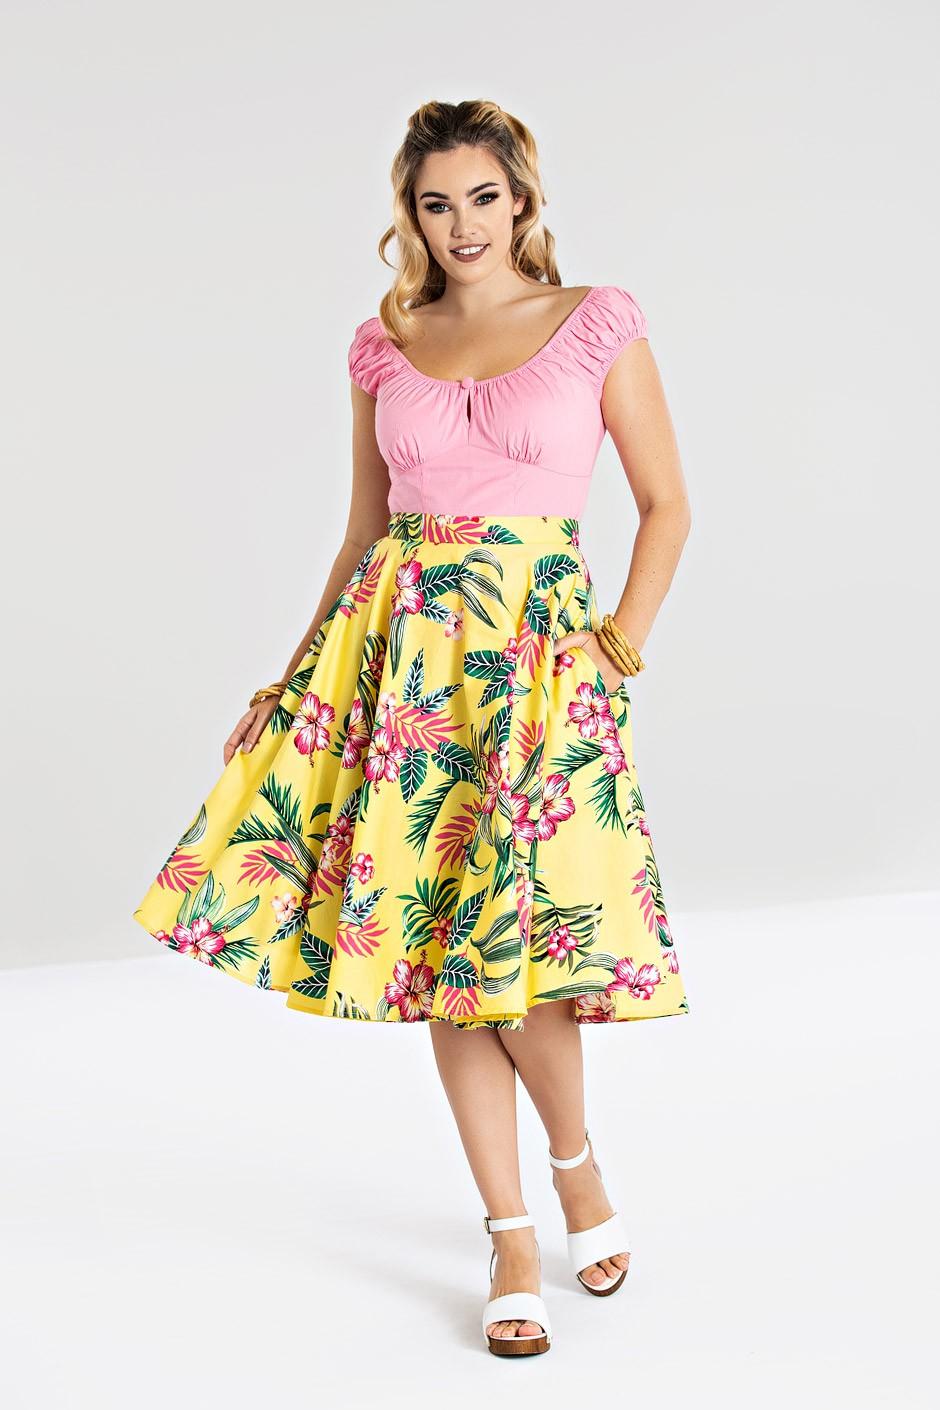 kalani skirt yellow